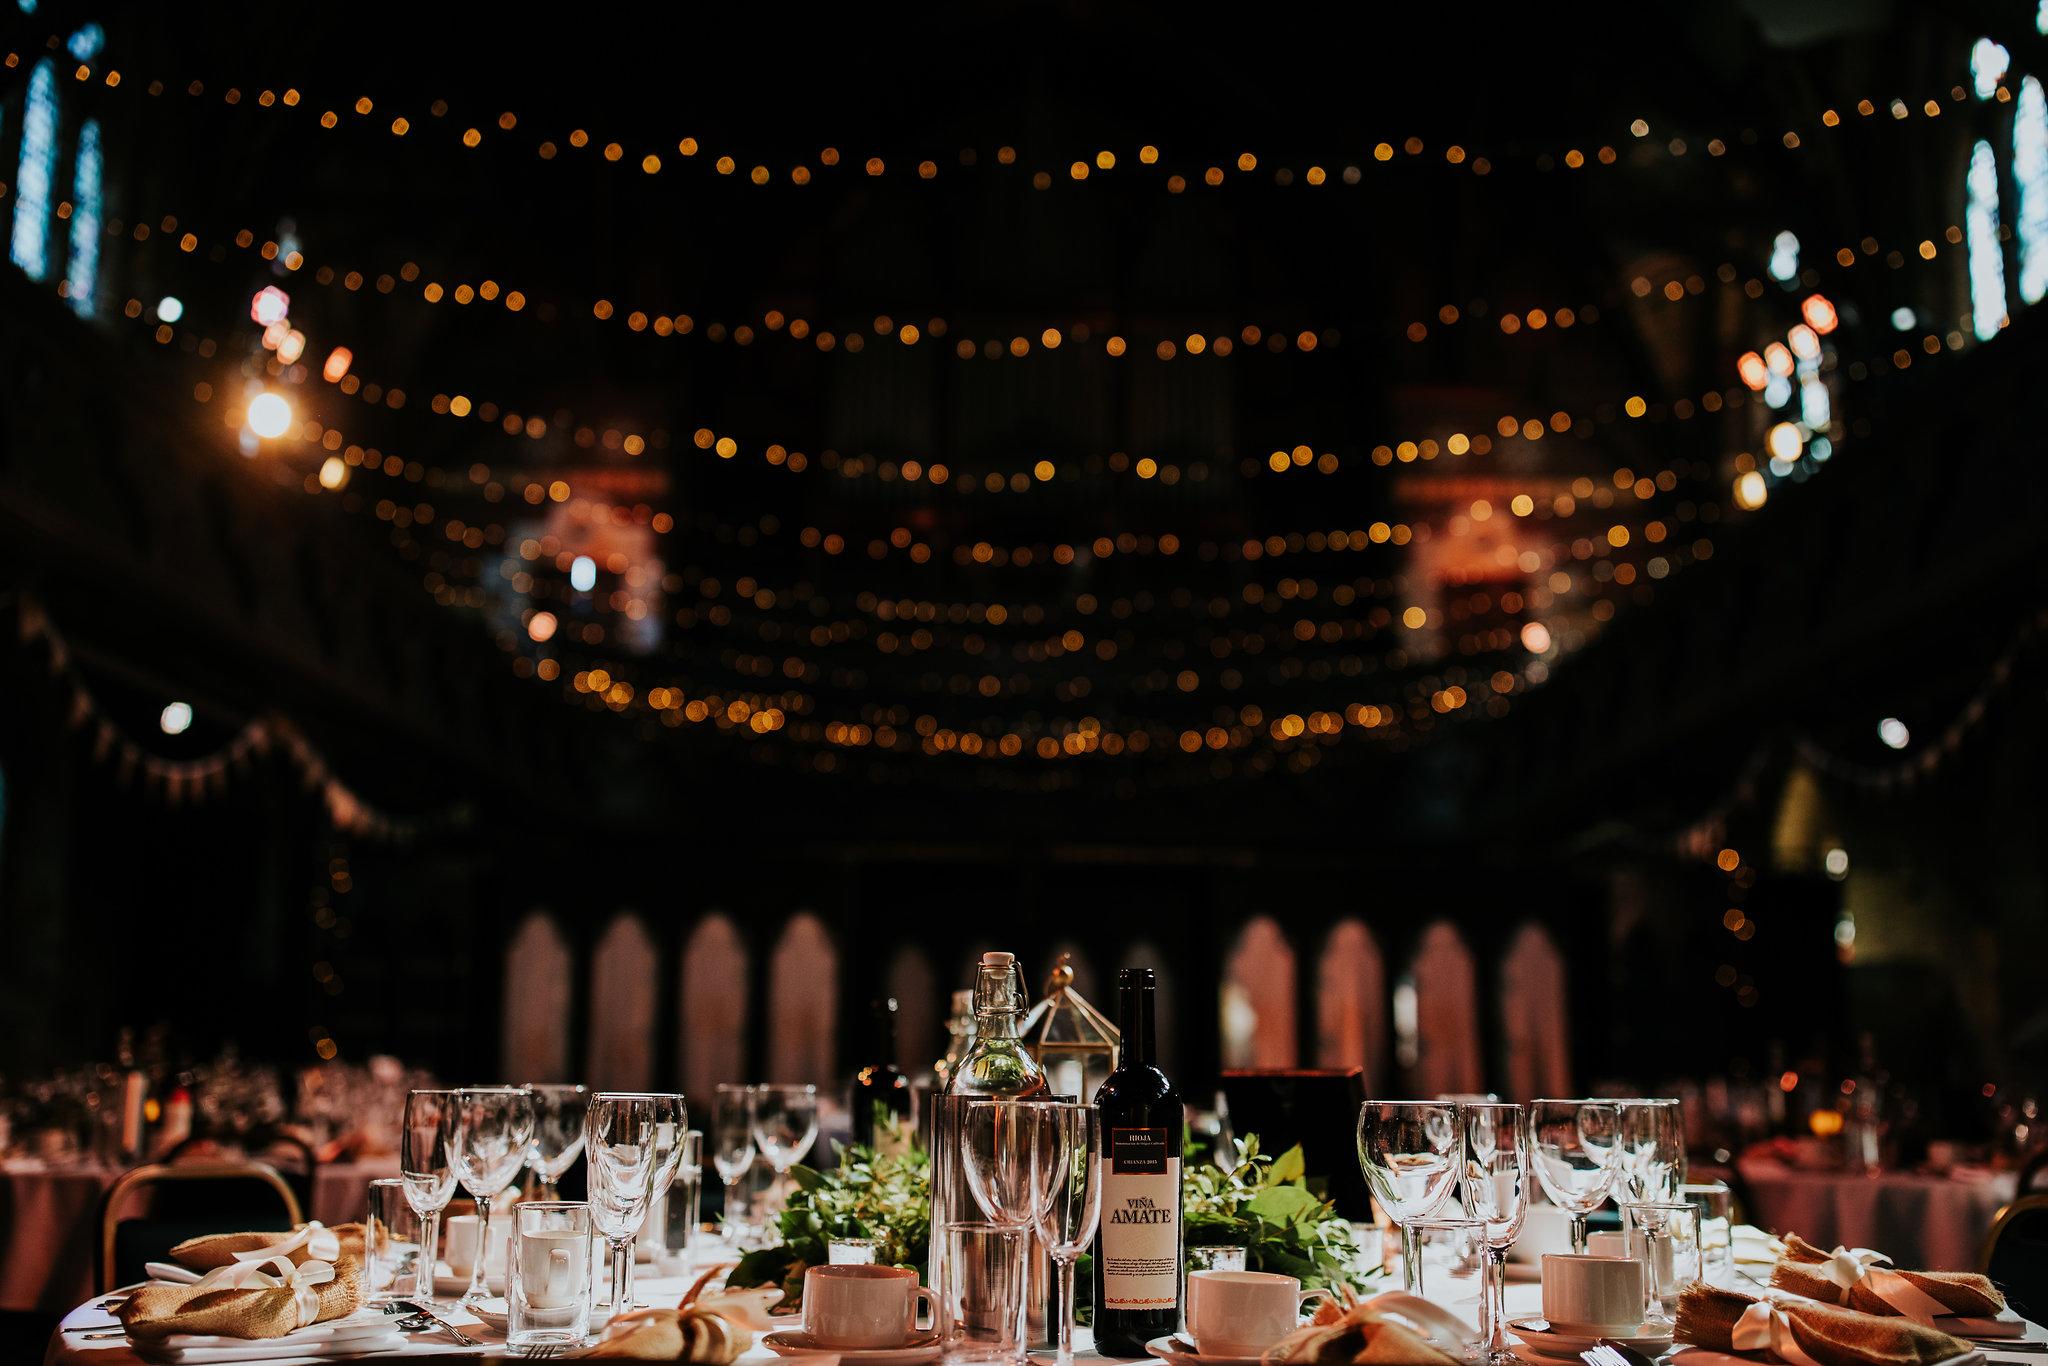 Cottiers wedding lavender and rose wedding florists scotland20.jpg